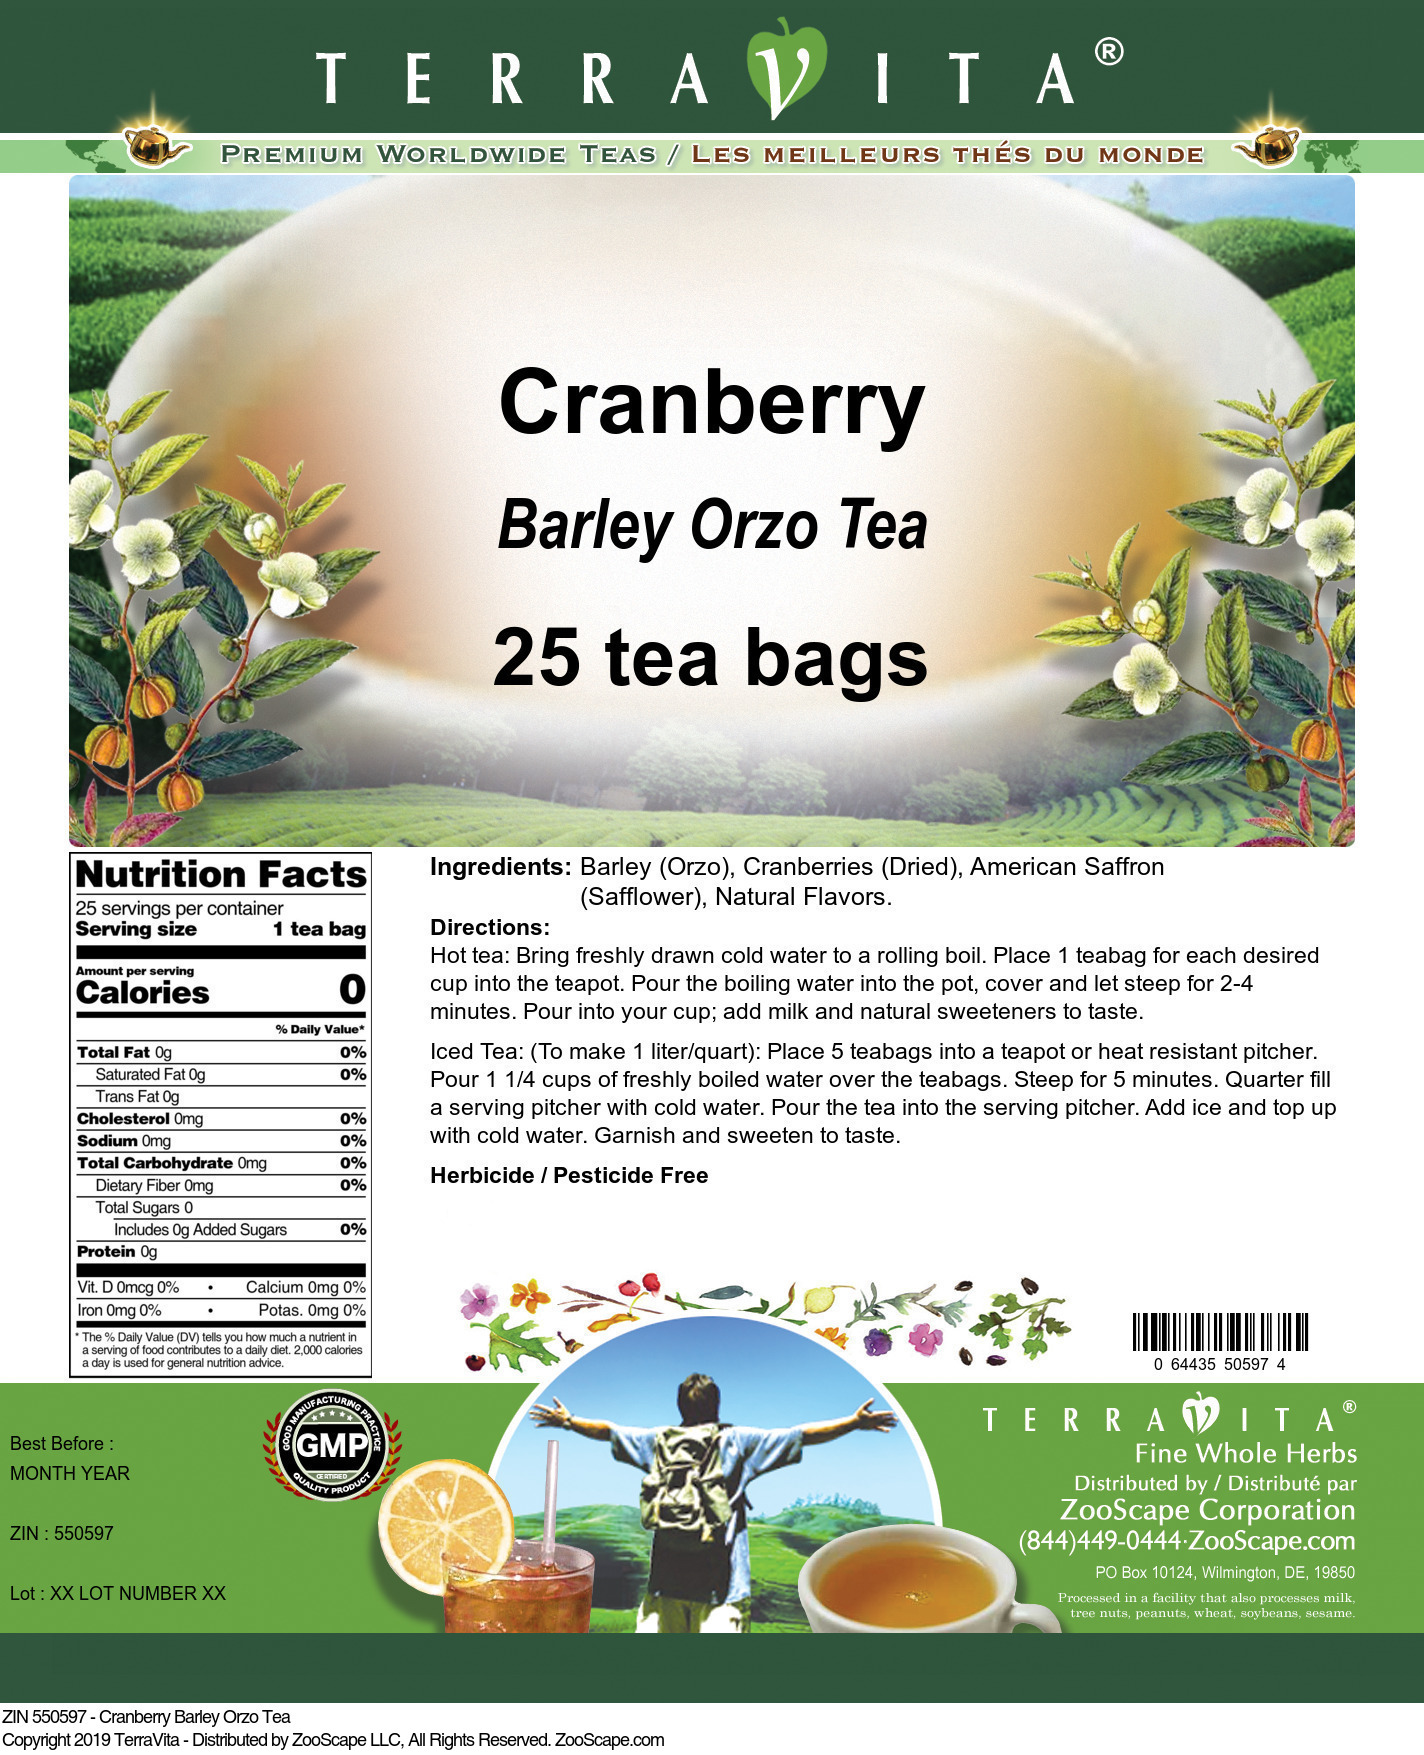 Cranberry Barley Orzo